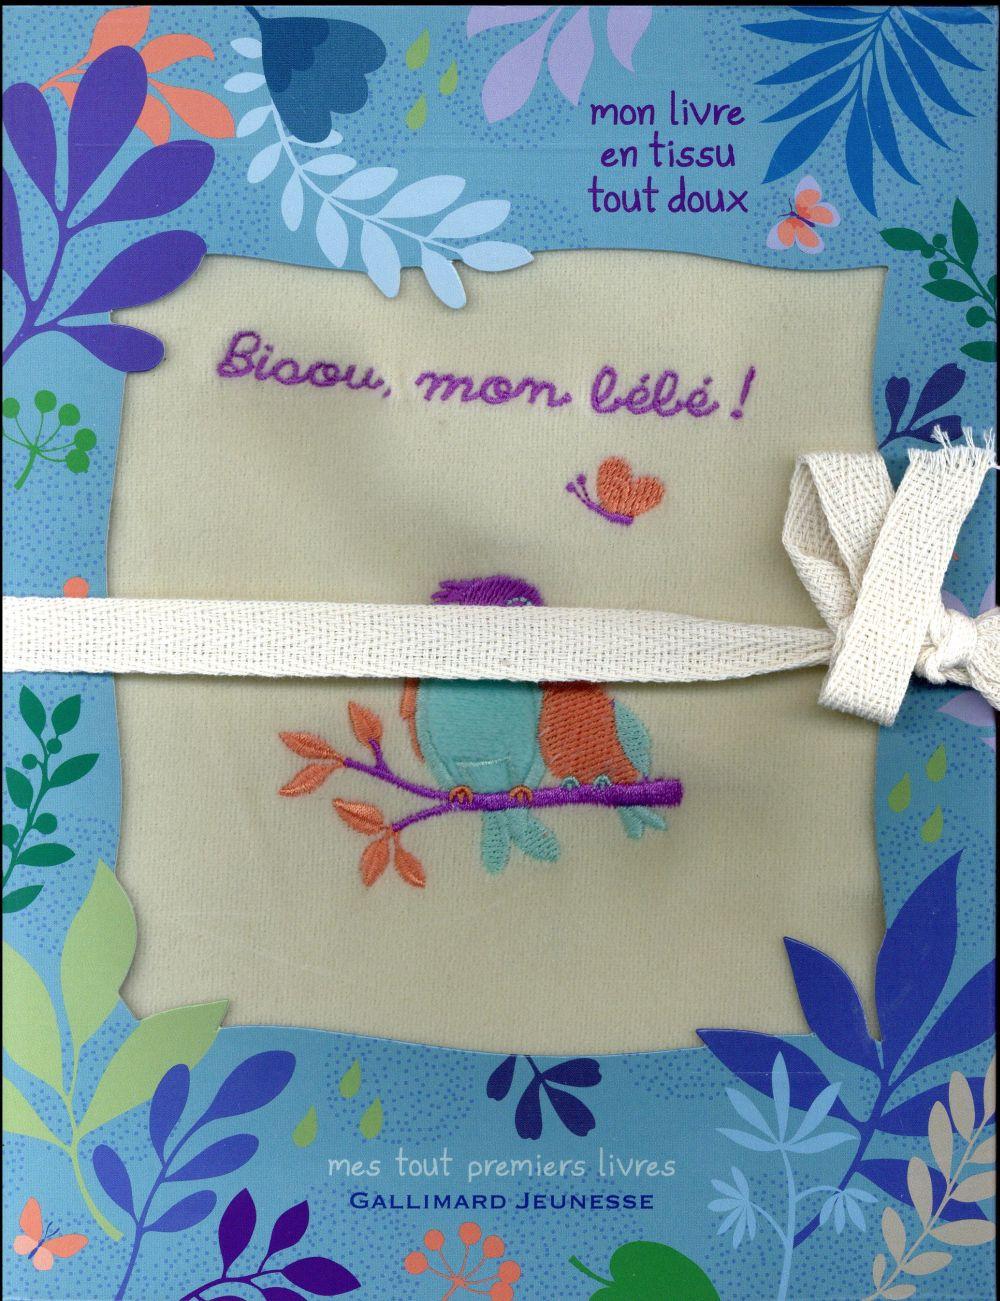 BISOU, MON BEBE !  Gallimard-Jeunesse